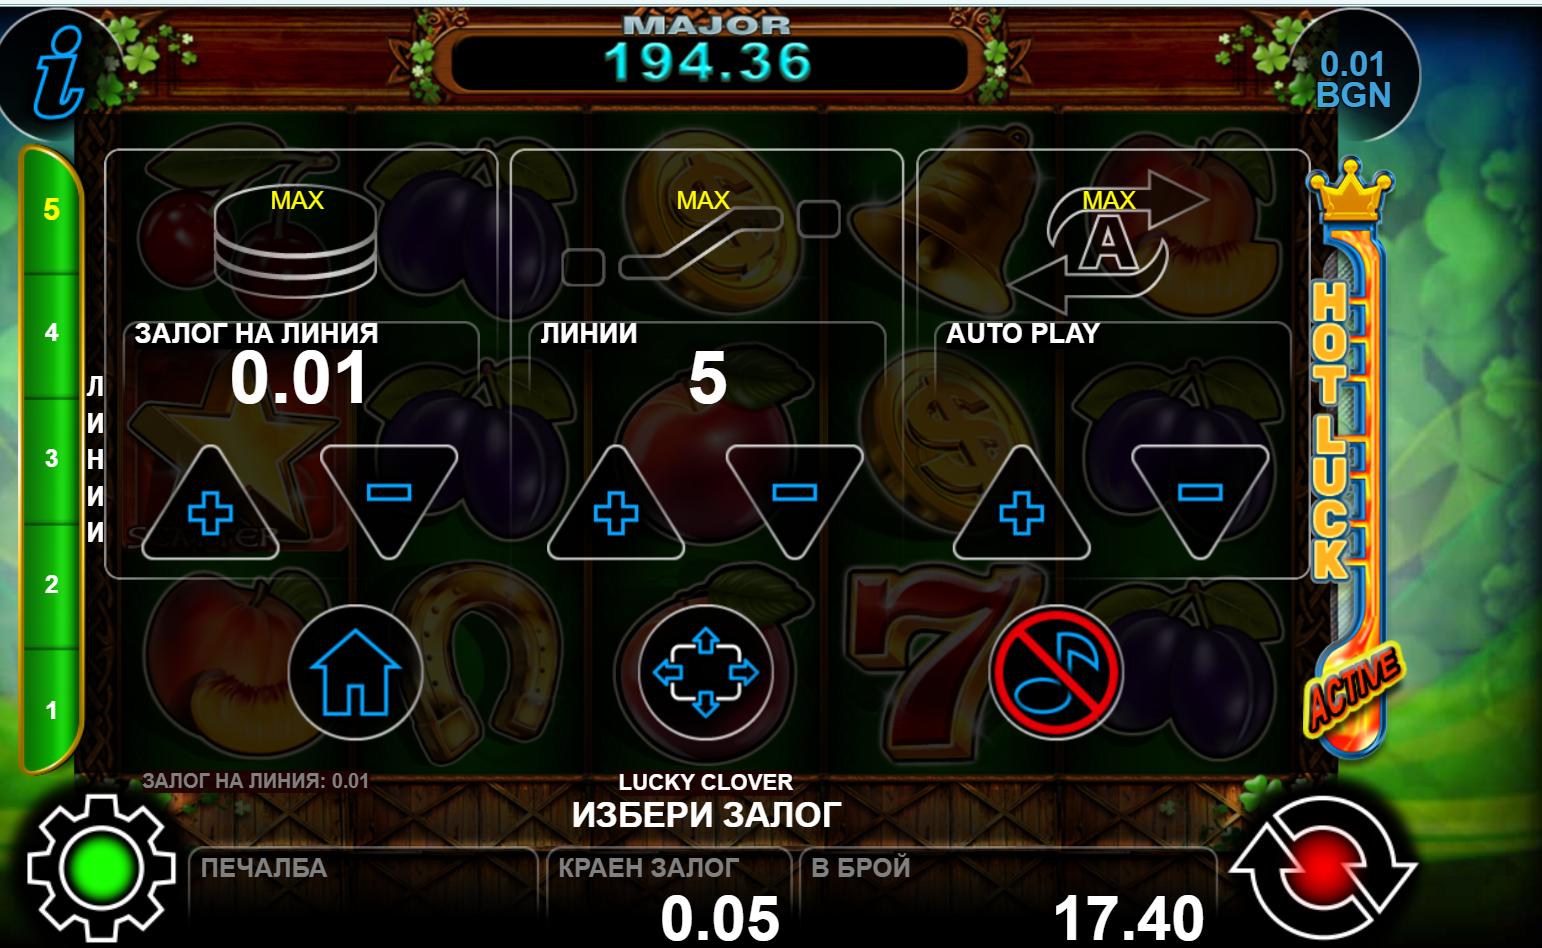 auto play casino slot igri-komarbet.com